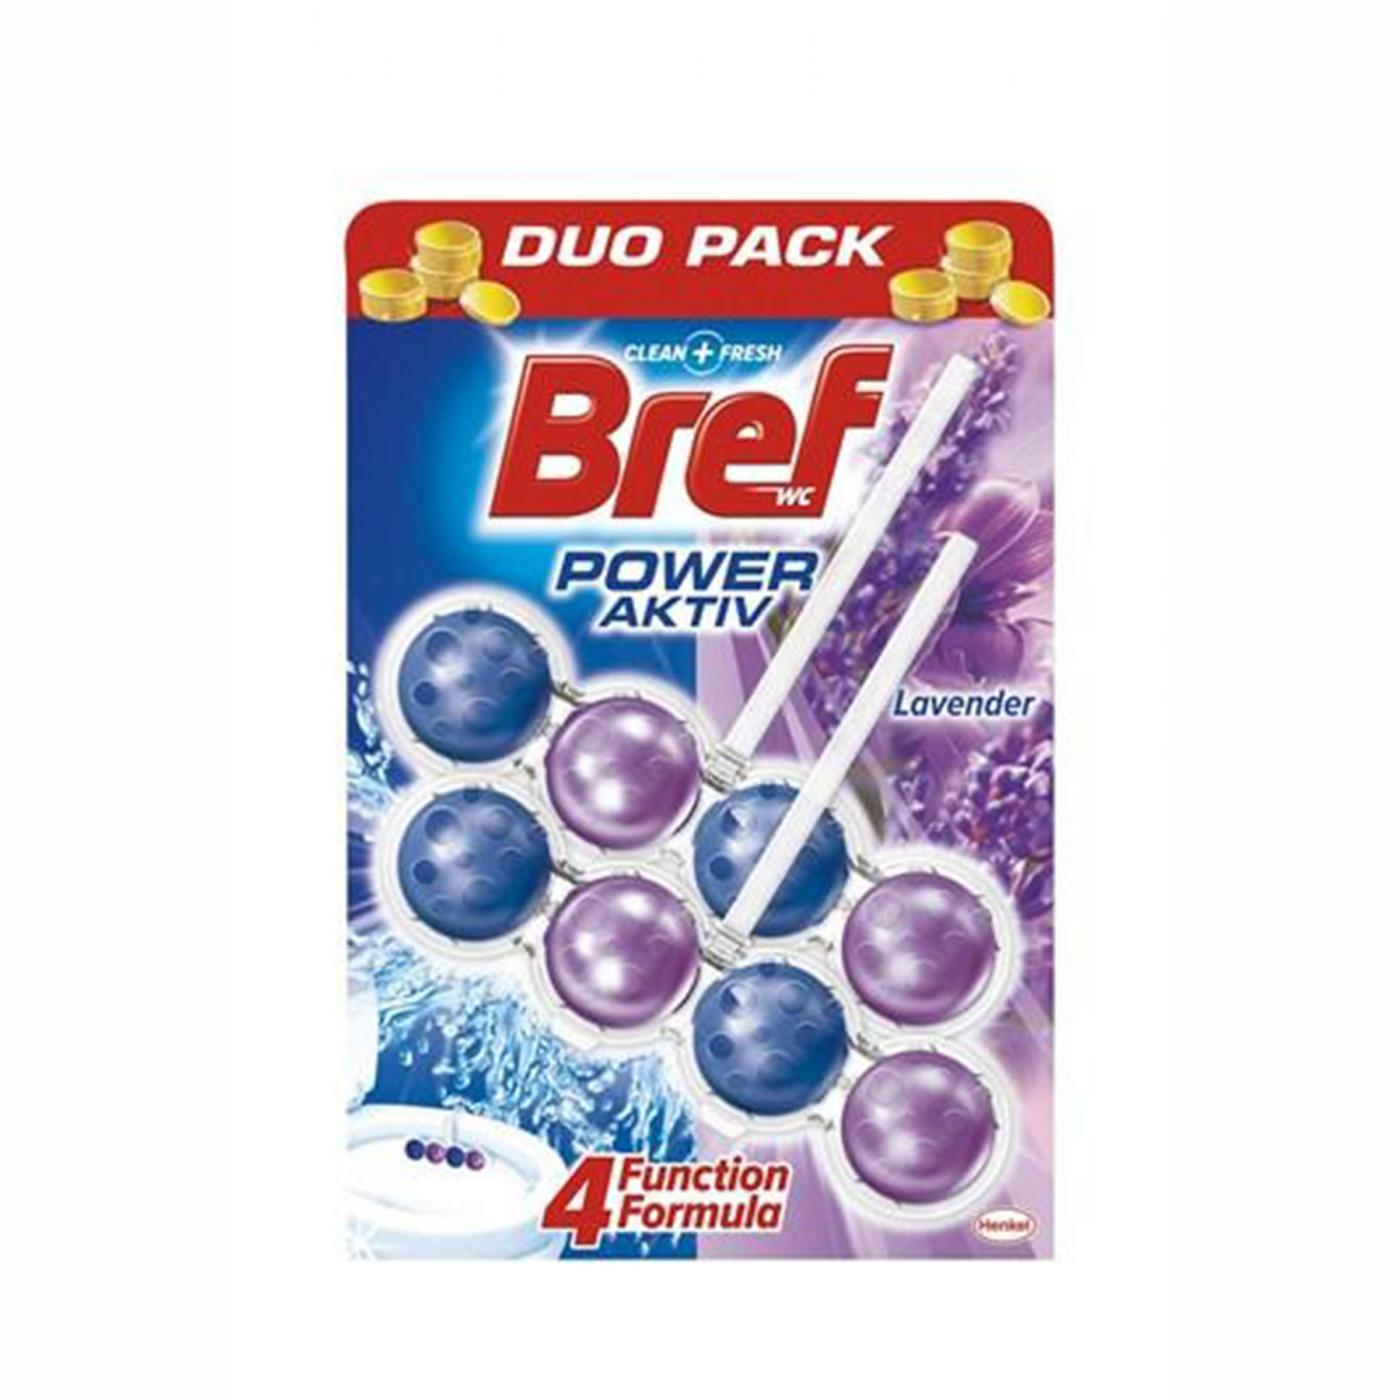 BREF POWER AKTİF 2*50GR DUO PACK 8Lİ LAVANTA